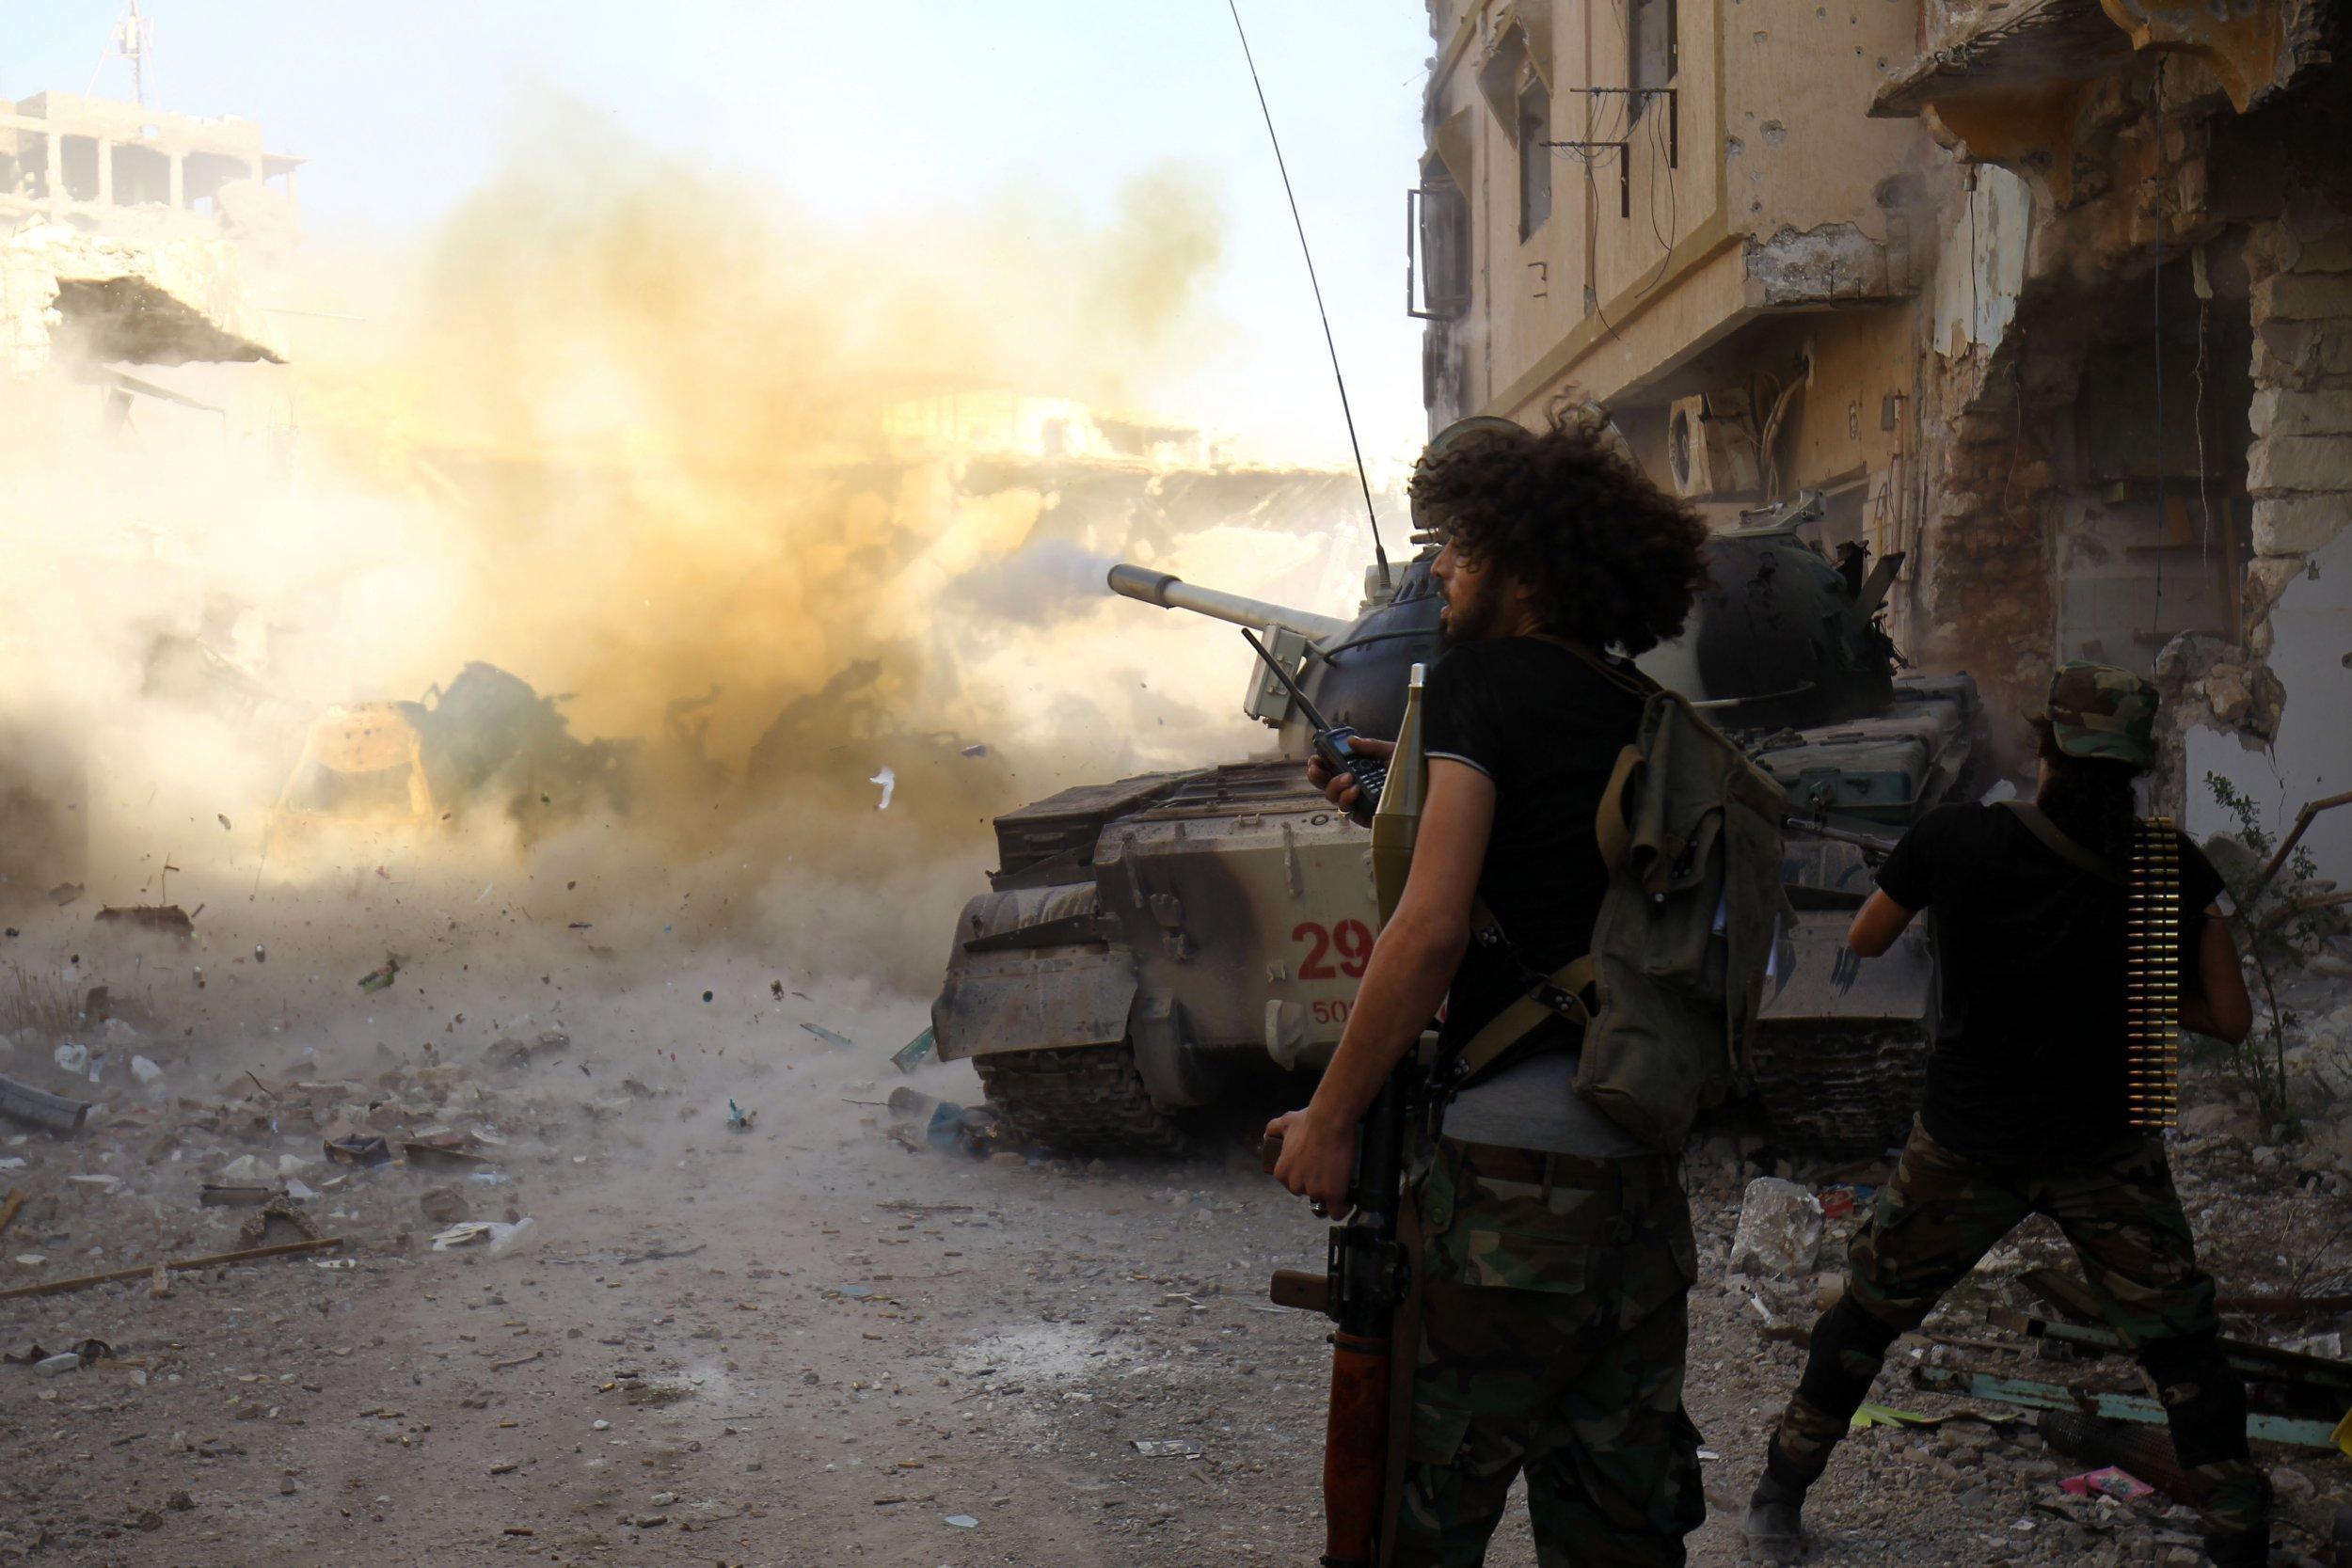 LNA soldiers fight in Benghazi Libya